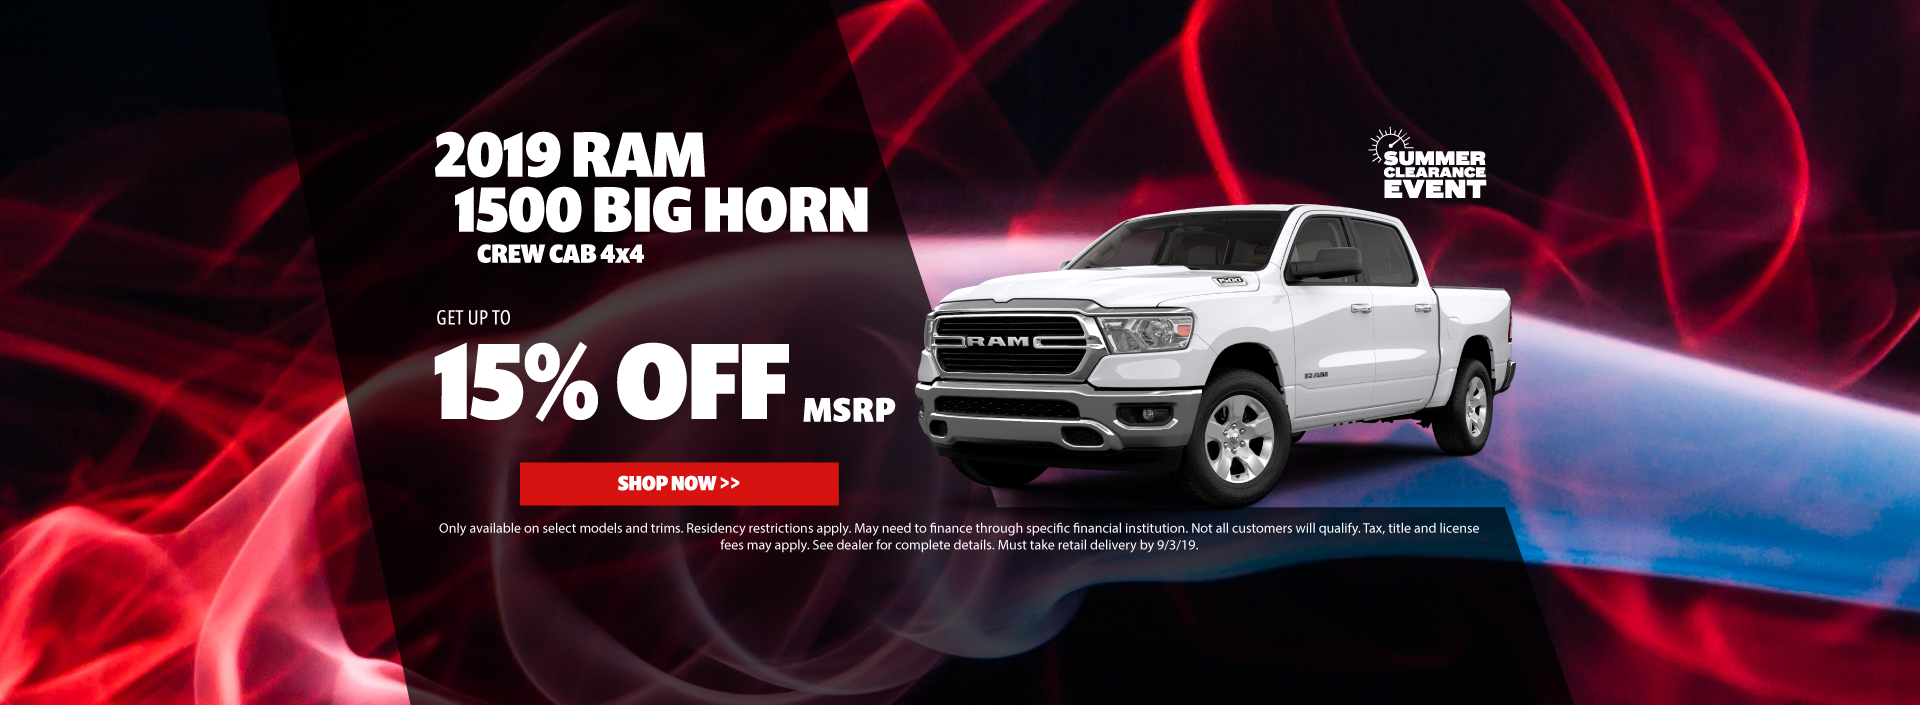 2019 Ram 1500 Big Horn Special